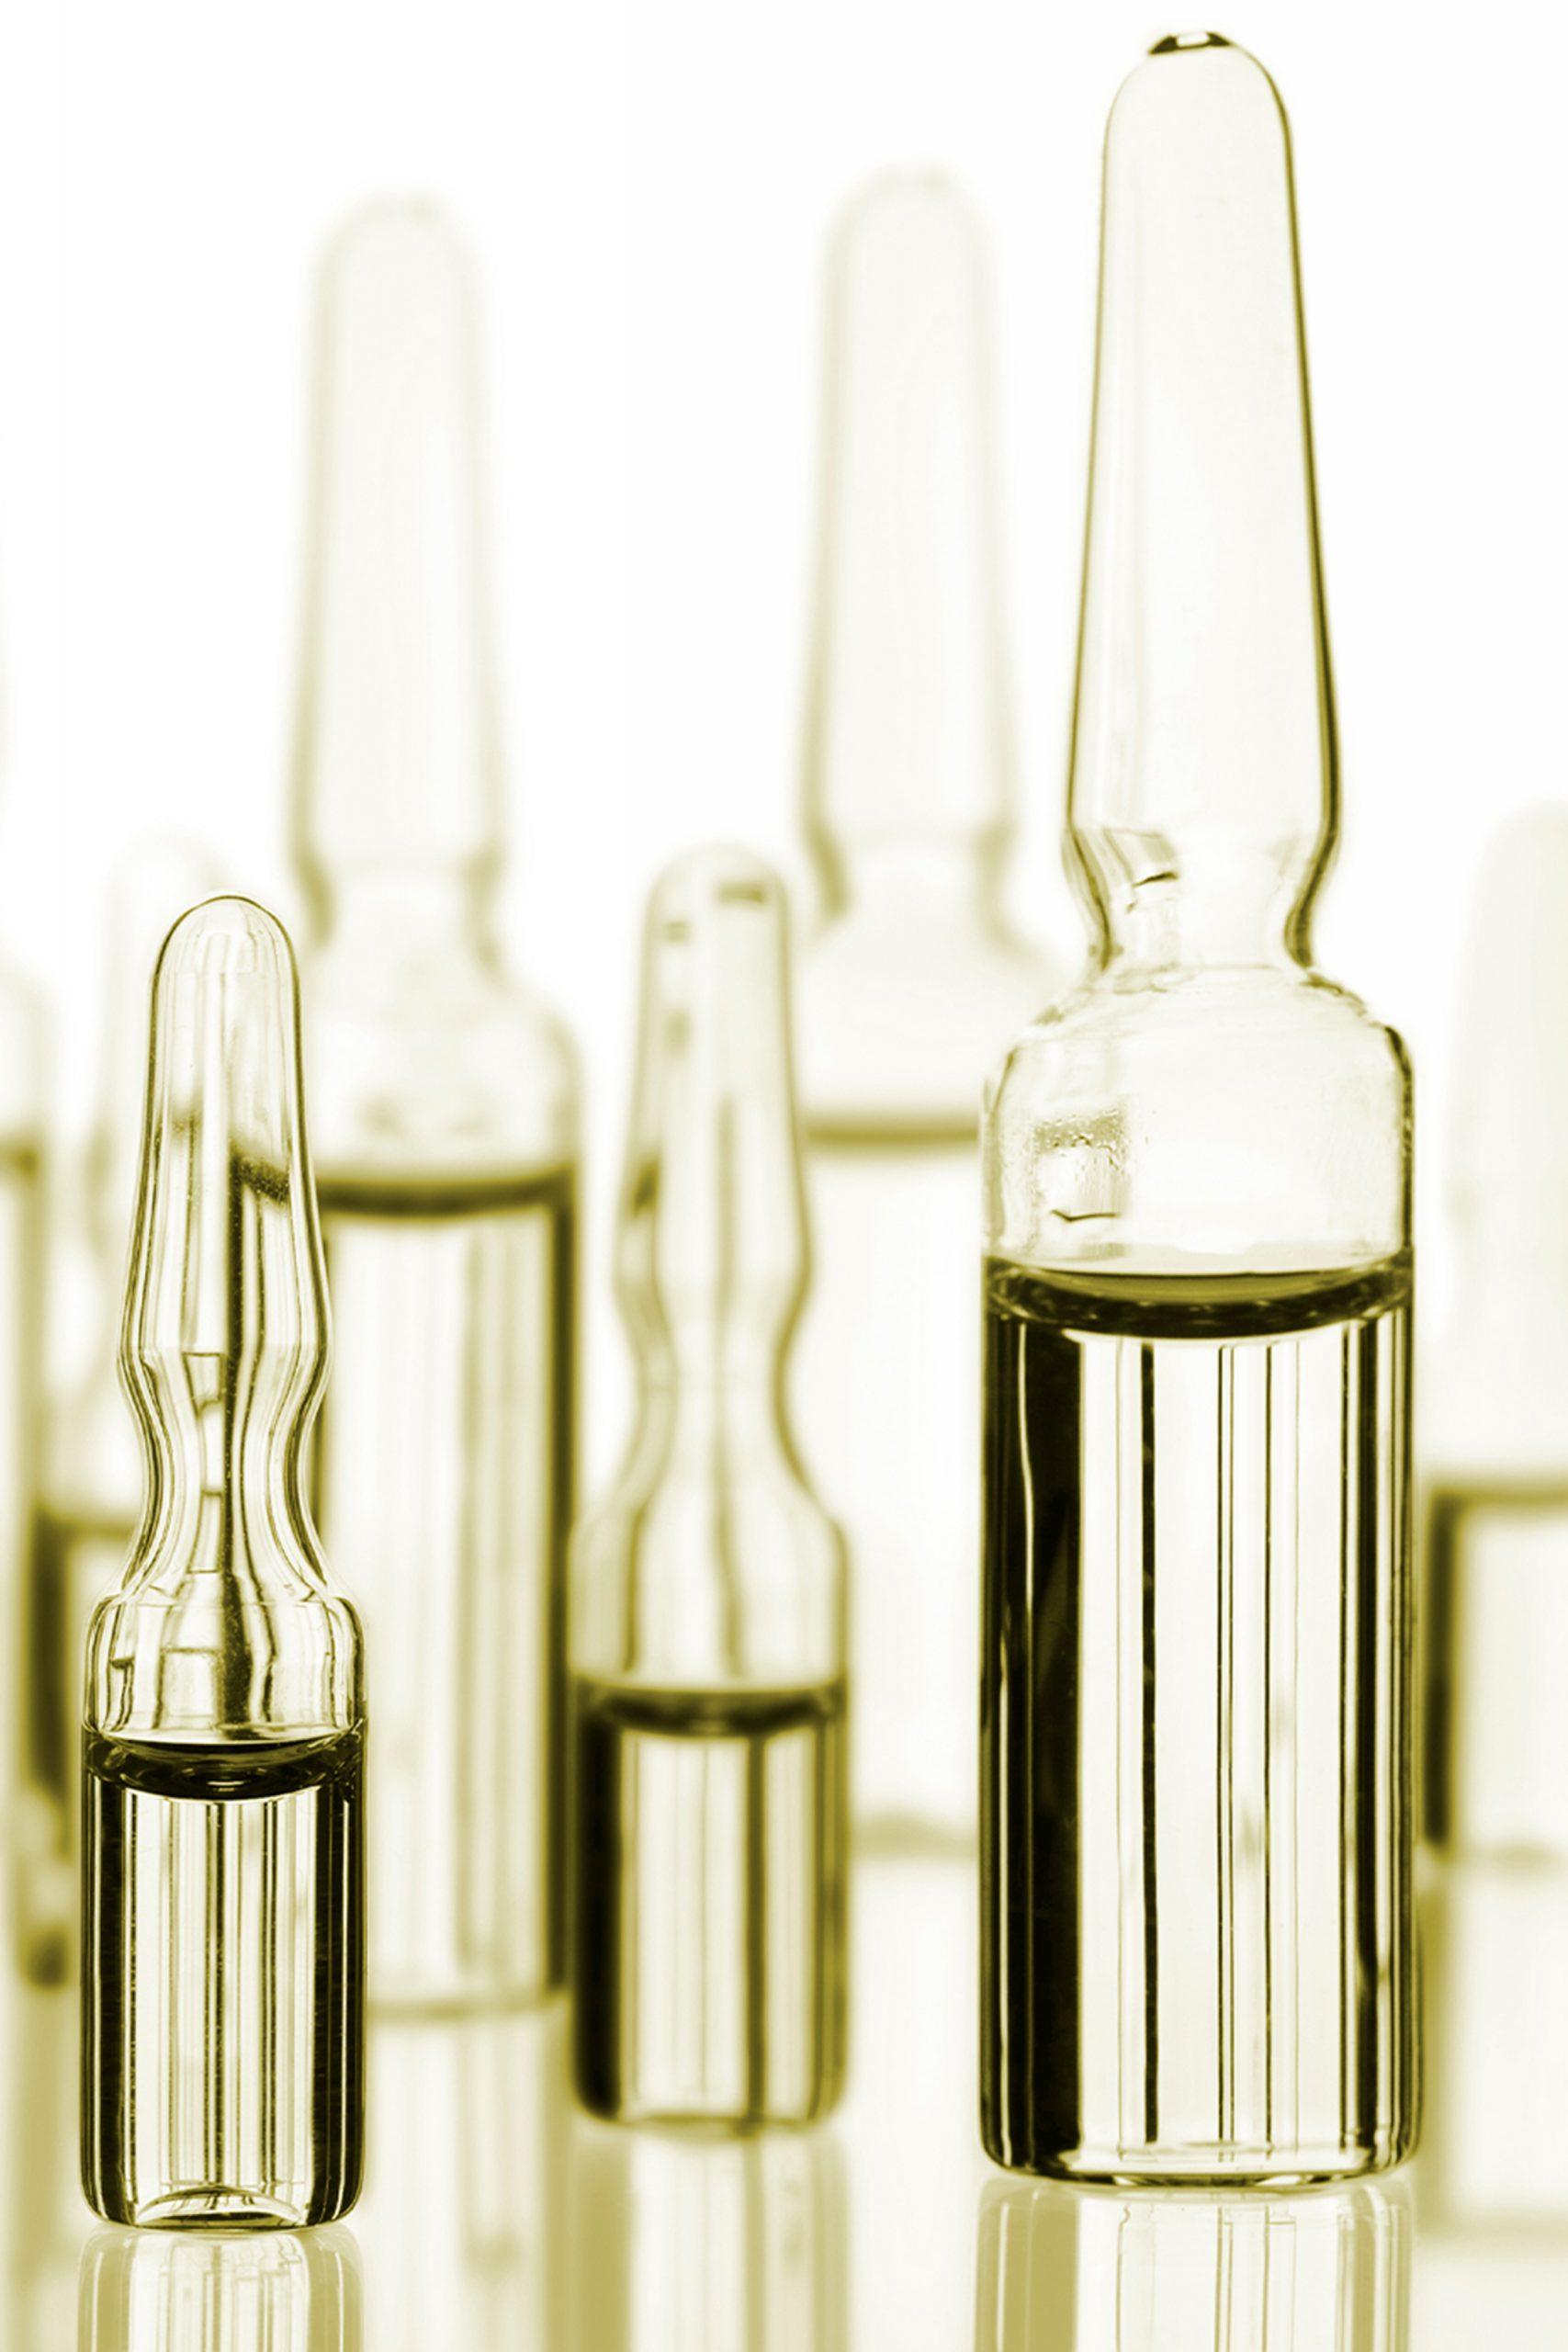 Profarma, Project Img 2 - Vatra Agency / Founder & CEO Gerton Bejo